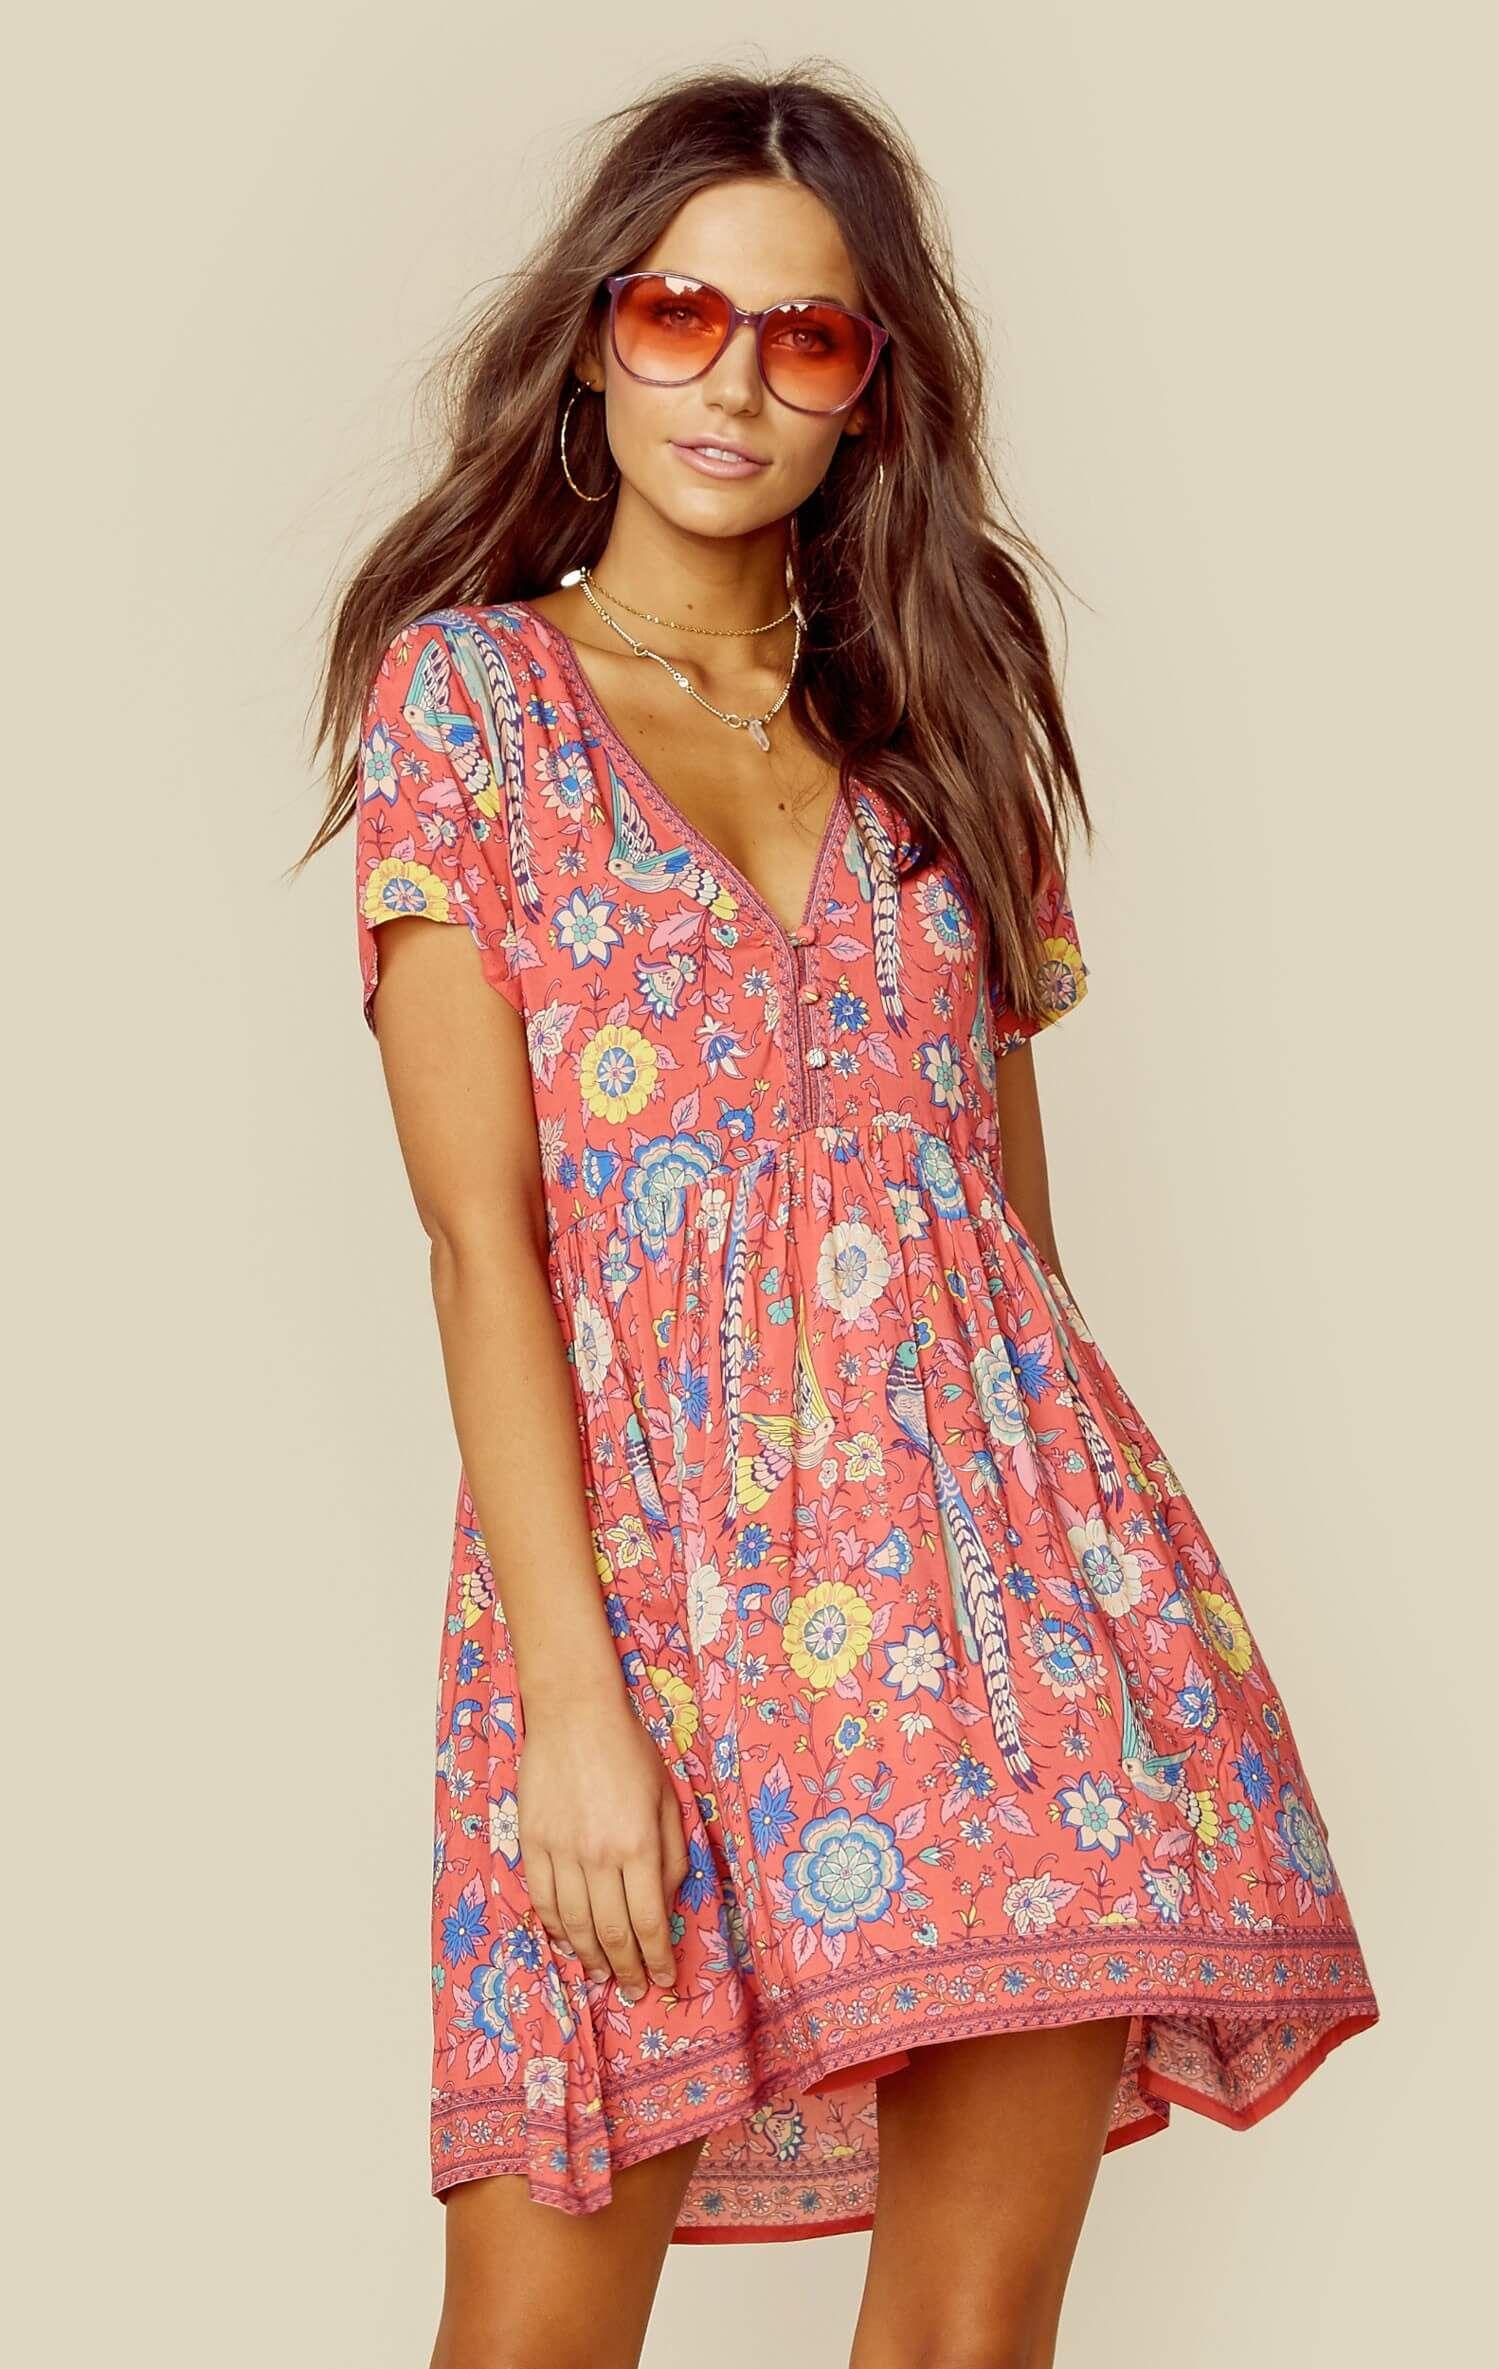 071667c672d9 LOVEBIRD MINI DRESS Boho Dress